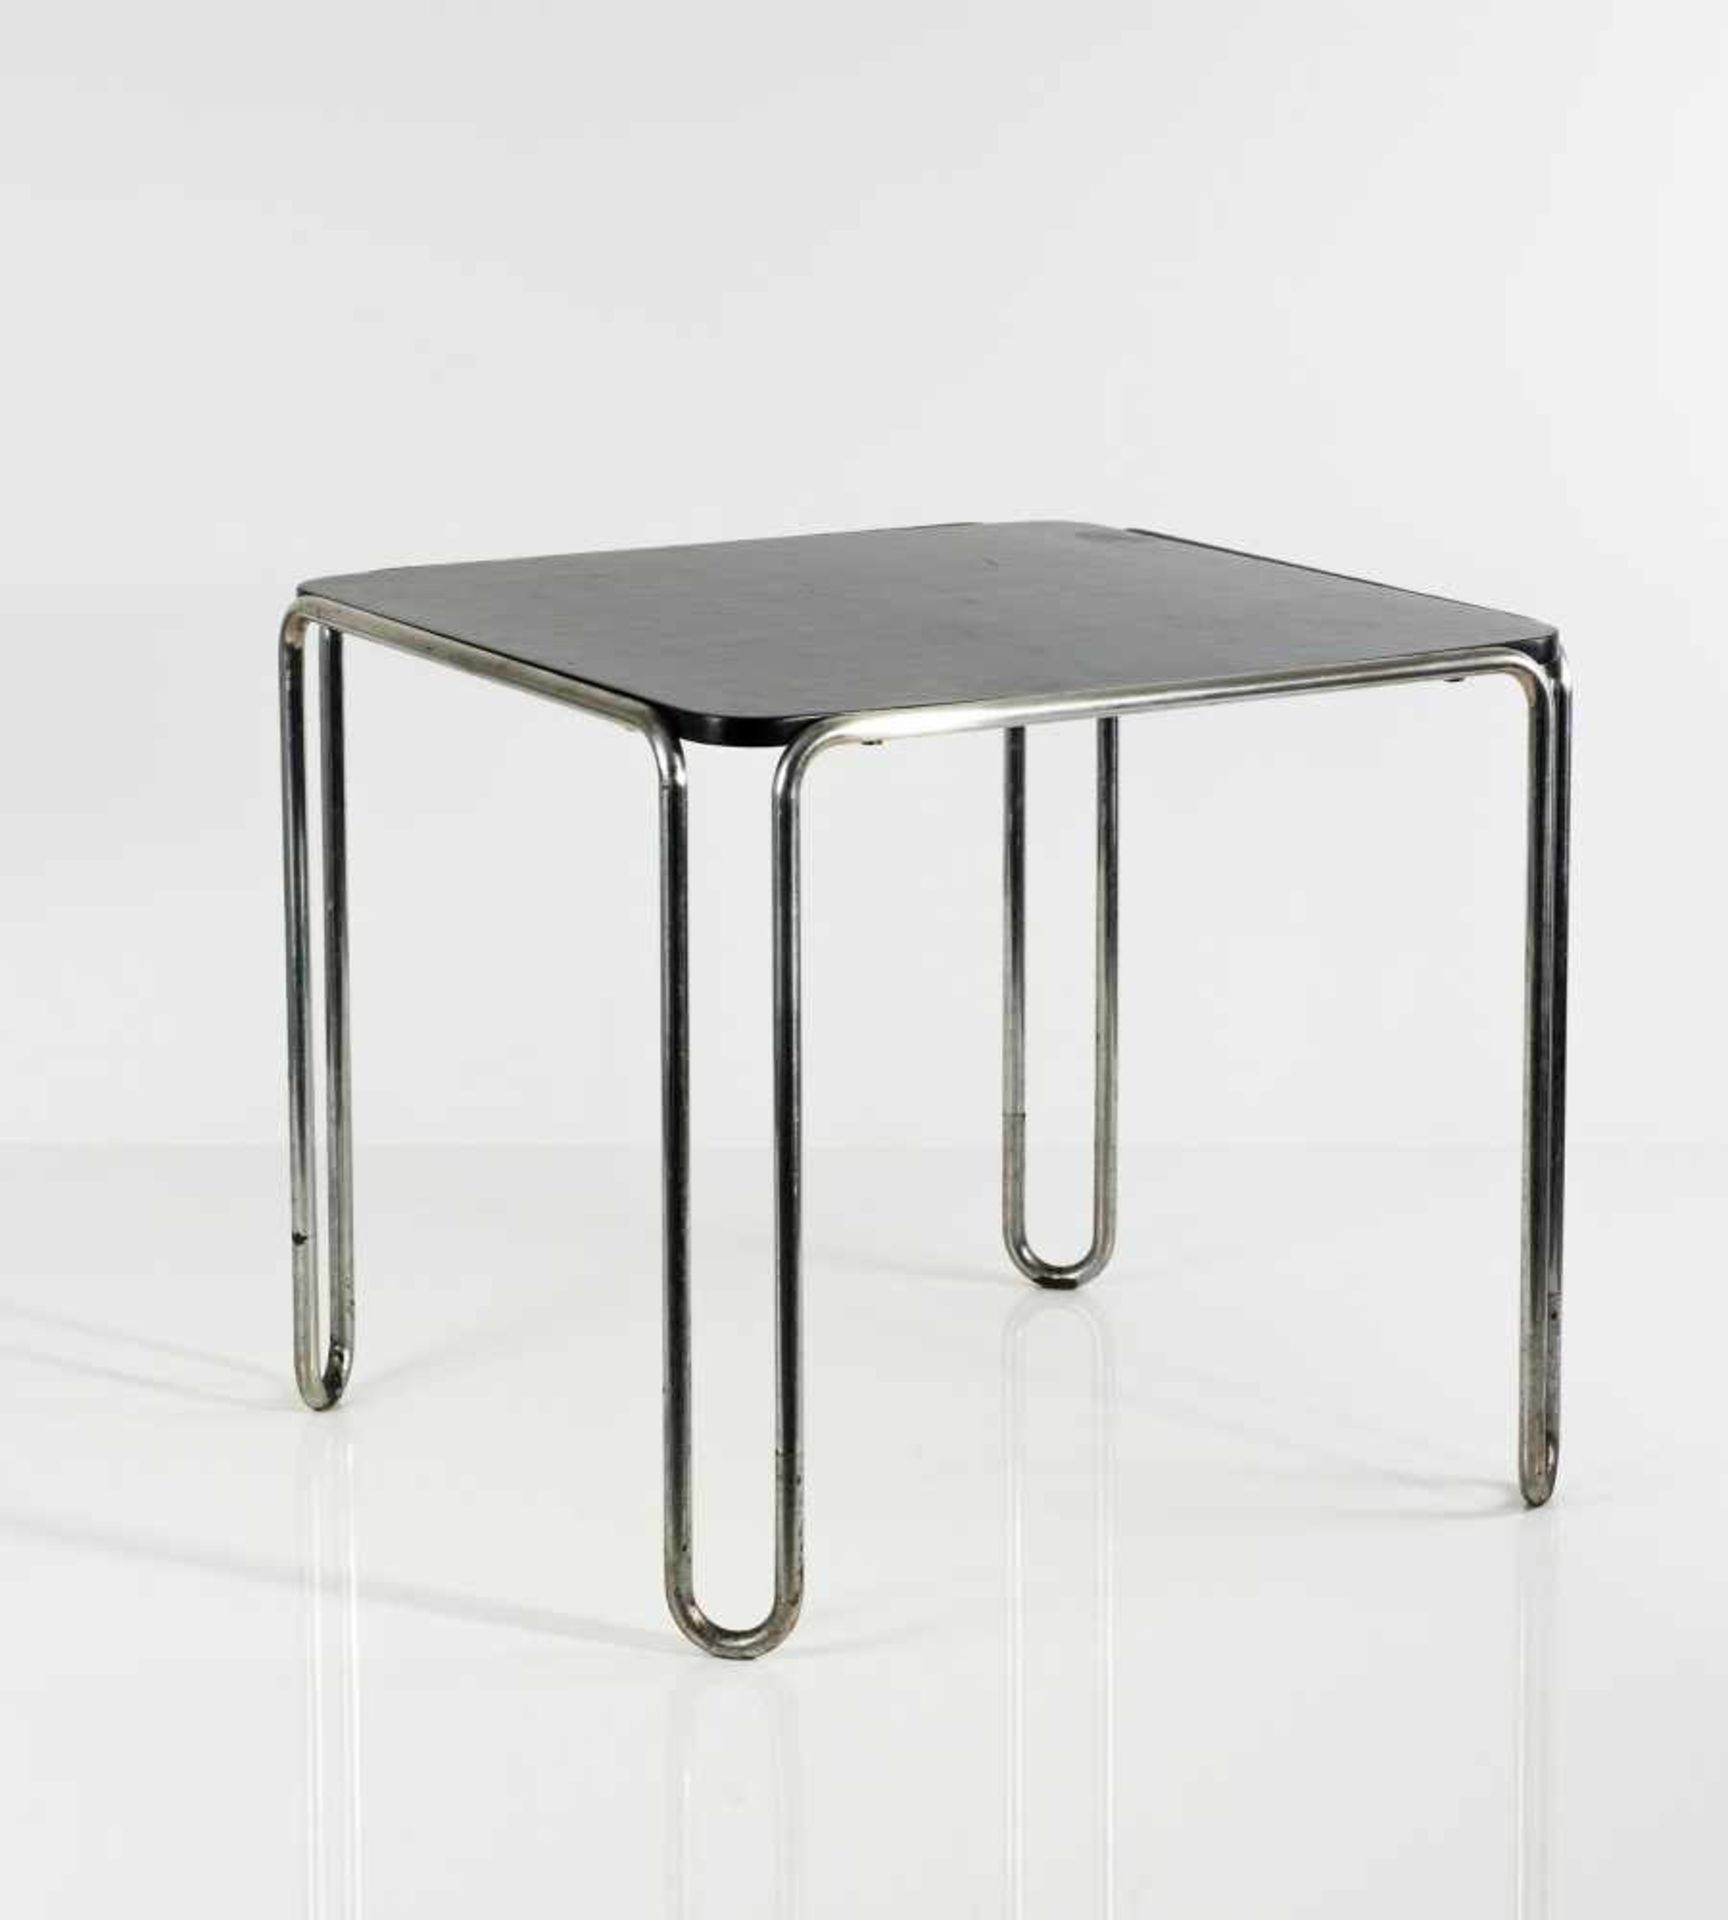 Los 8 - Marcel Breuer Tisch 'B 10', 1927 H. 66 x 75,5 x 75,5 cm; Rohr-Dm. 2,2 cm. Thonet Mundus,